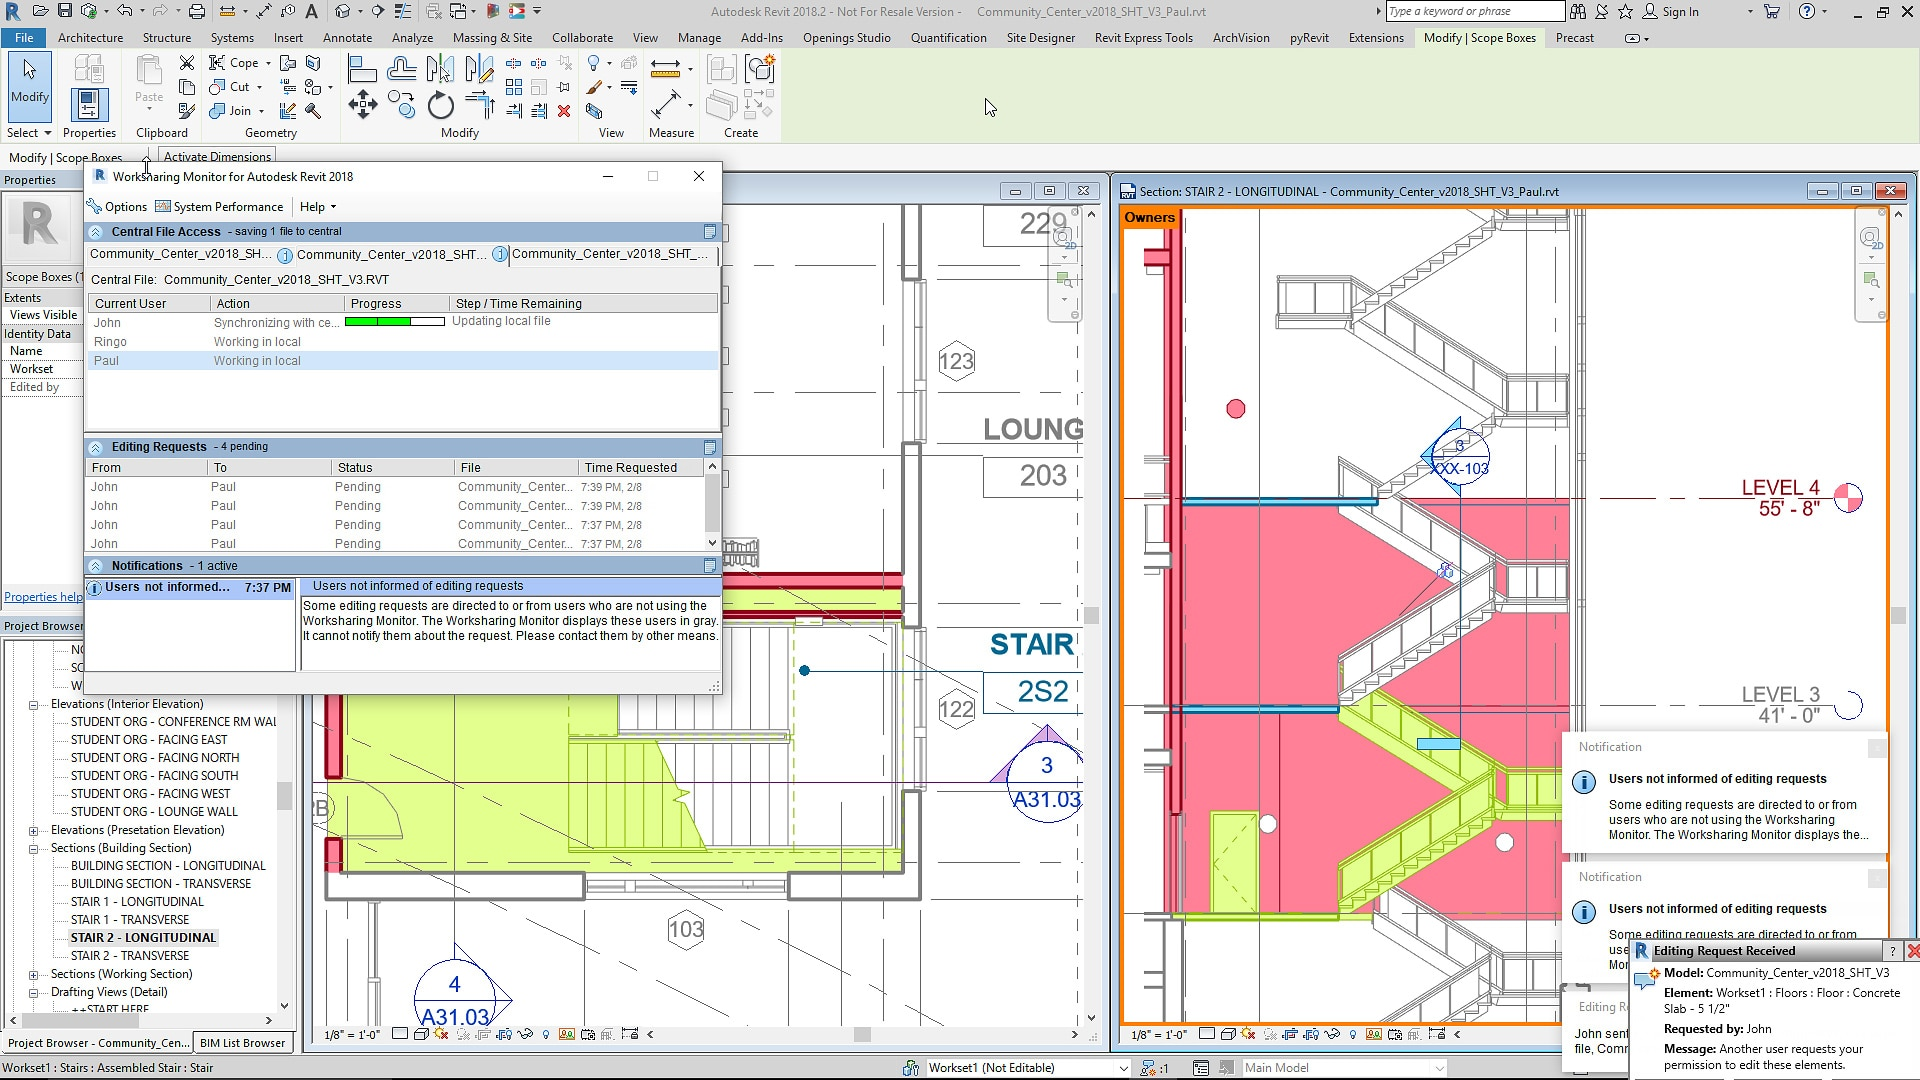 BIM-Software-Funktionen | Revit 2019 | Autodesk